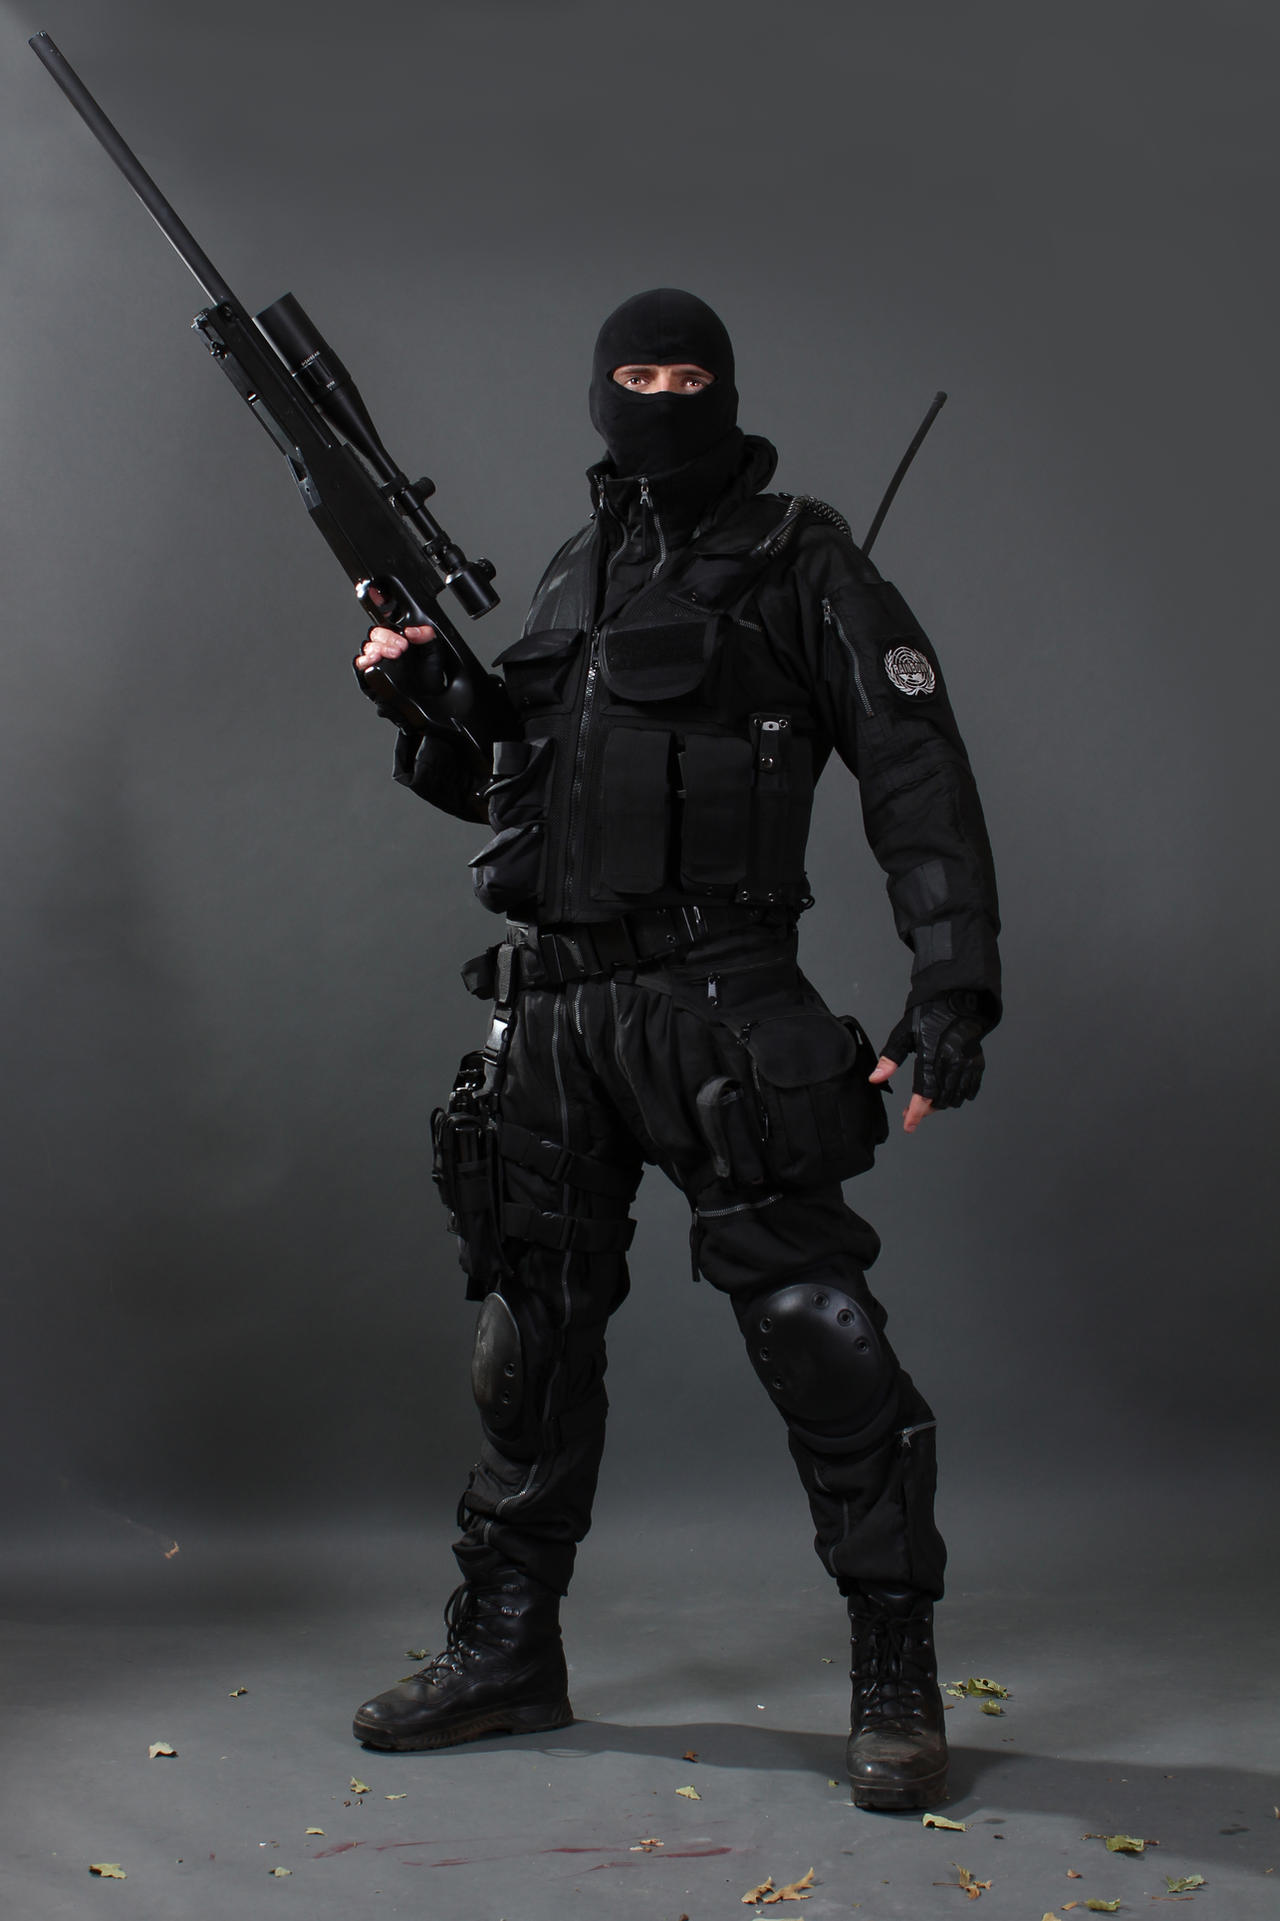 Sniper STOCK XIII by PhelanDavion